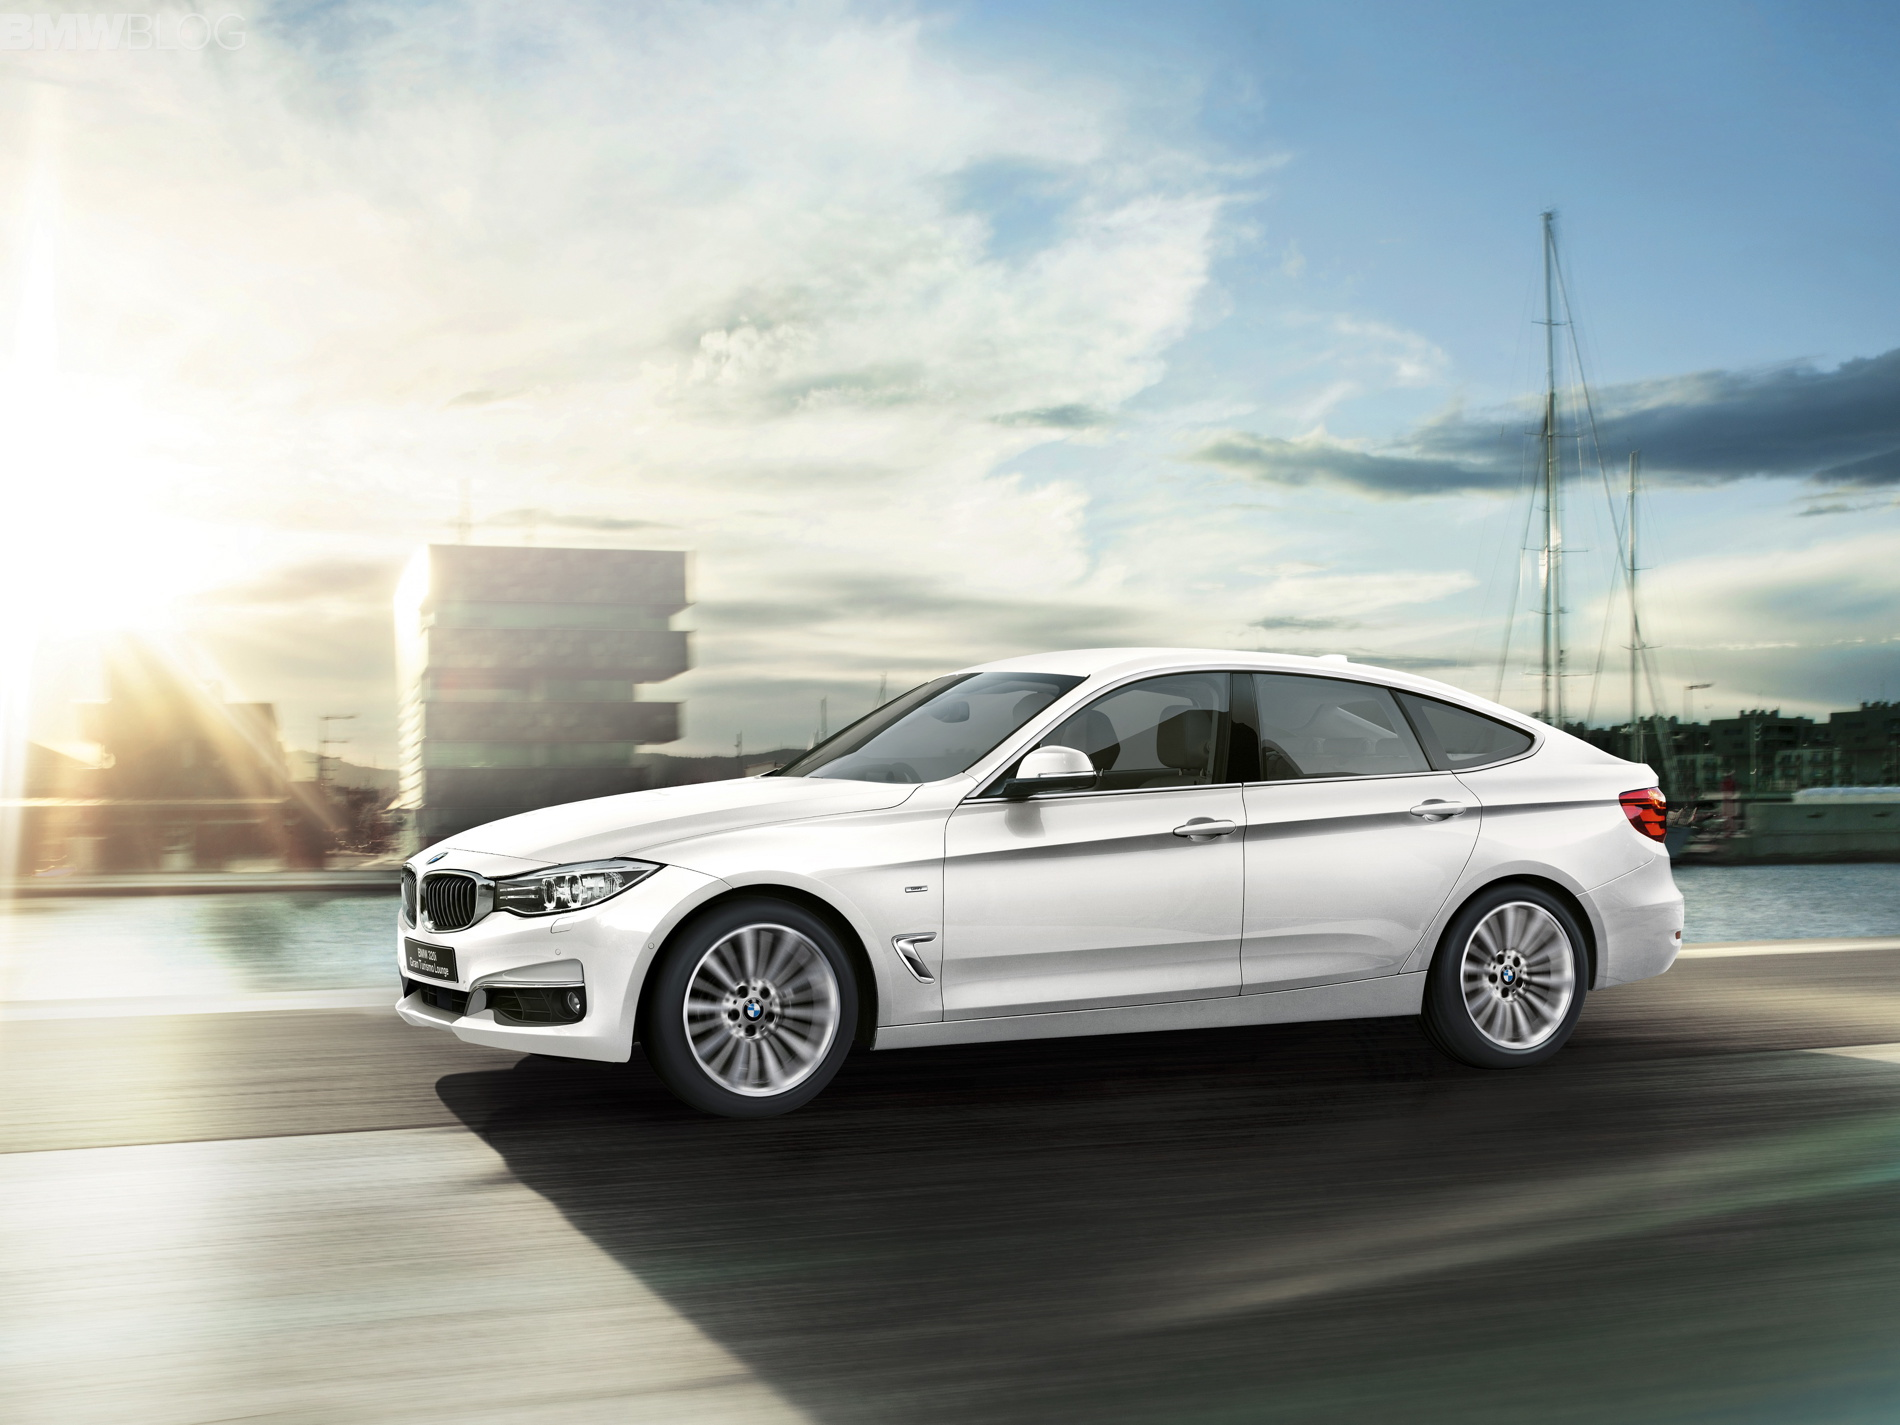 BMW 3 Series GT Luxury Lounge